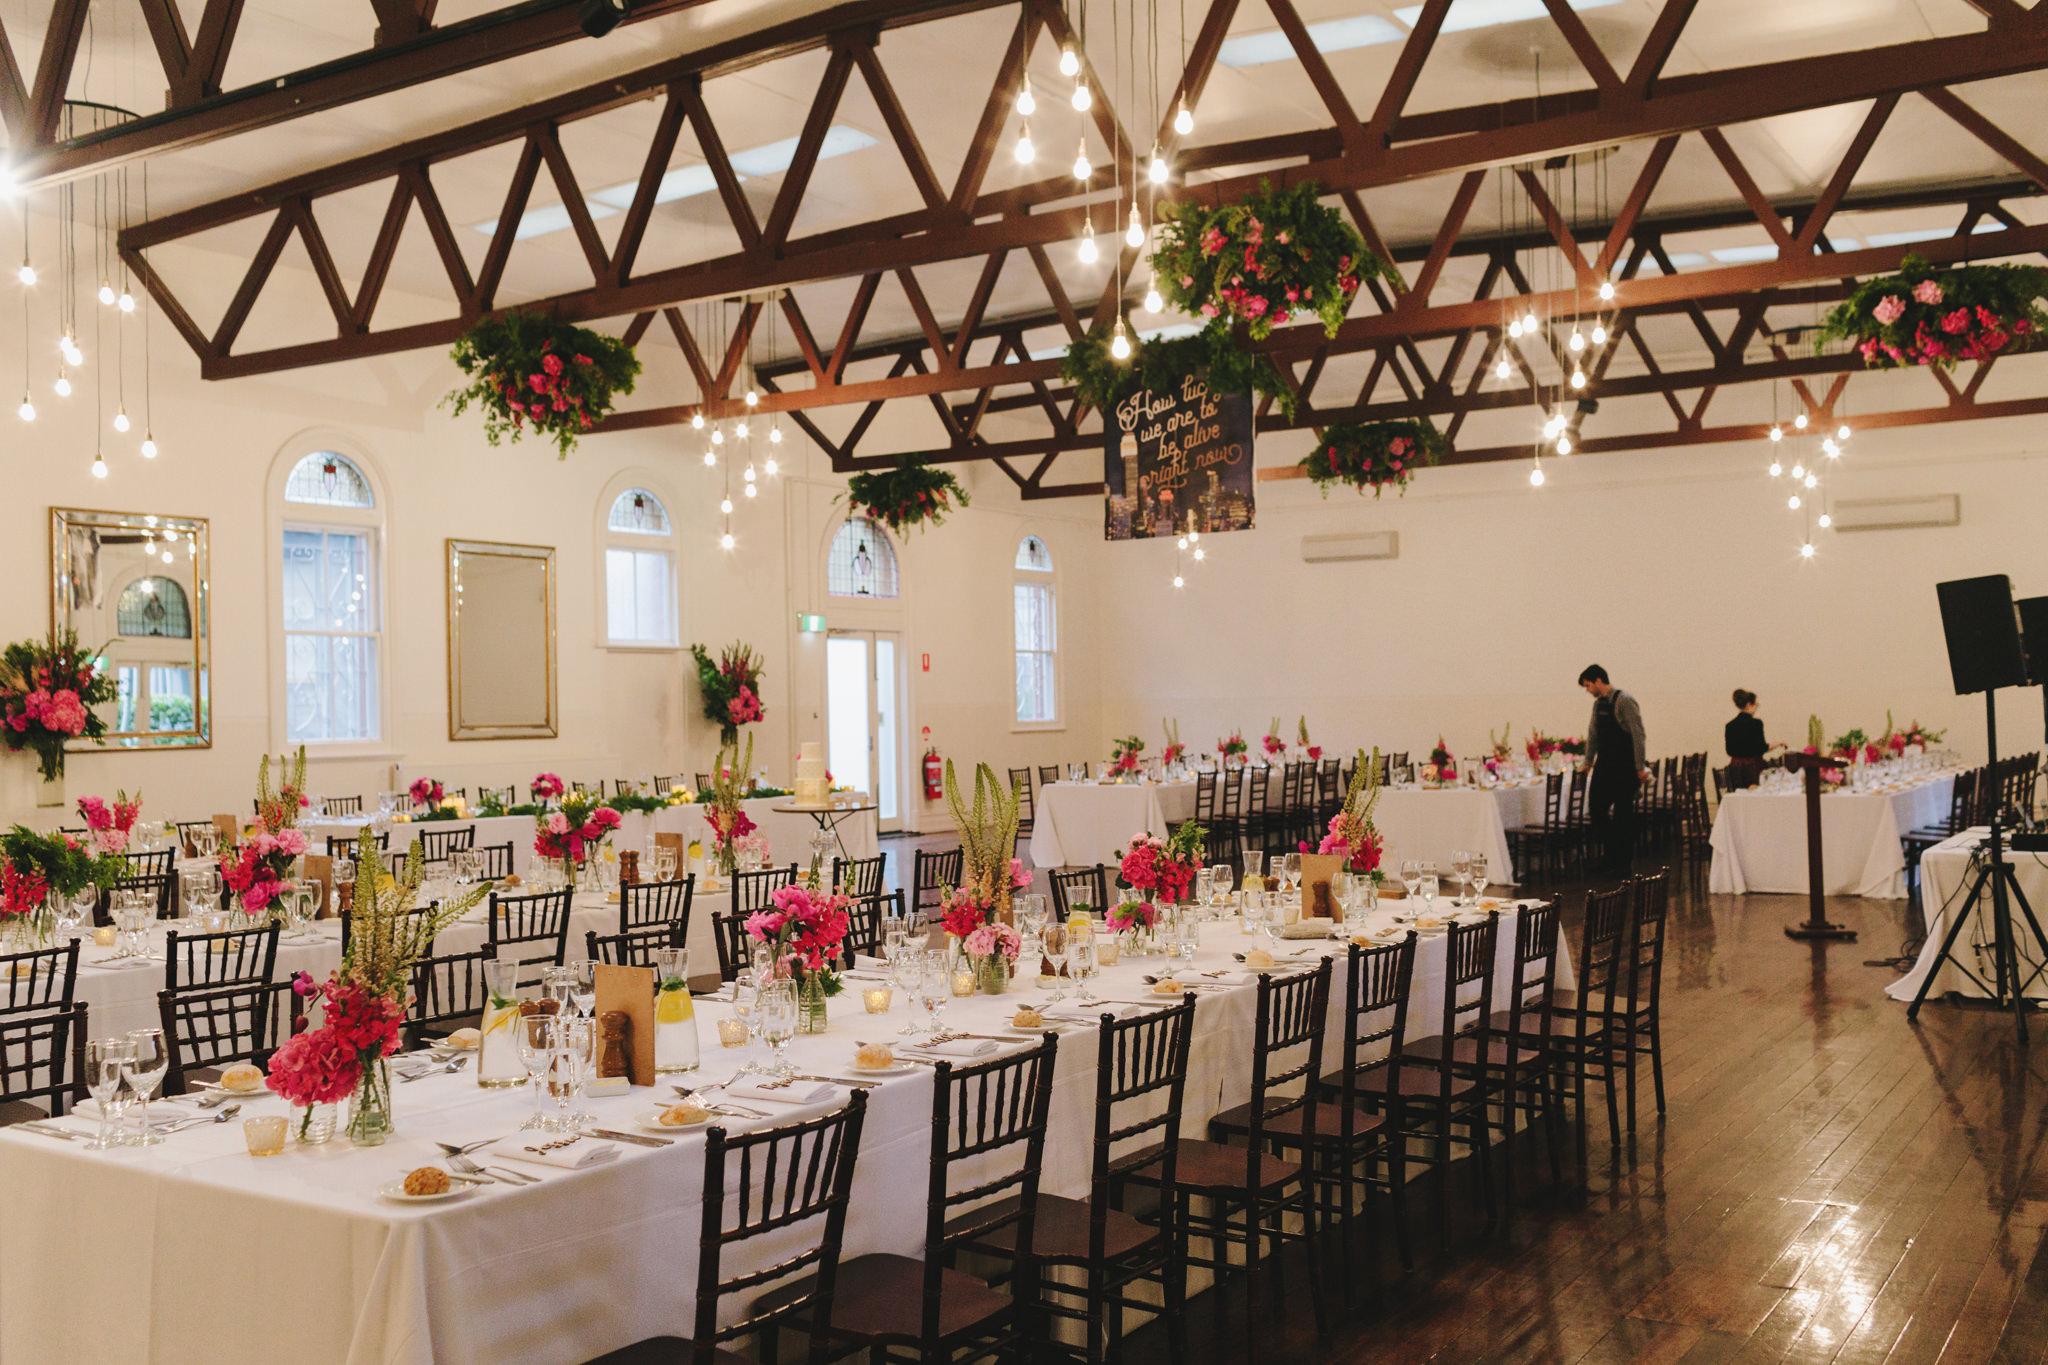 Abbotsford_Convent_Wedding_Peter_Anna093.JPG